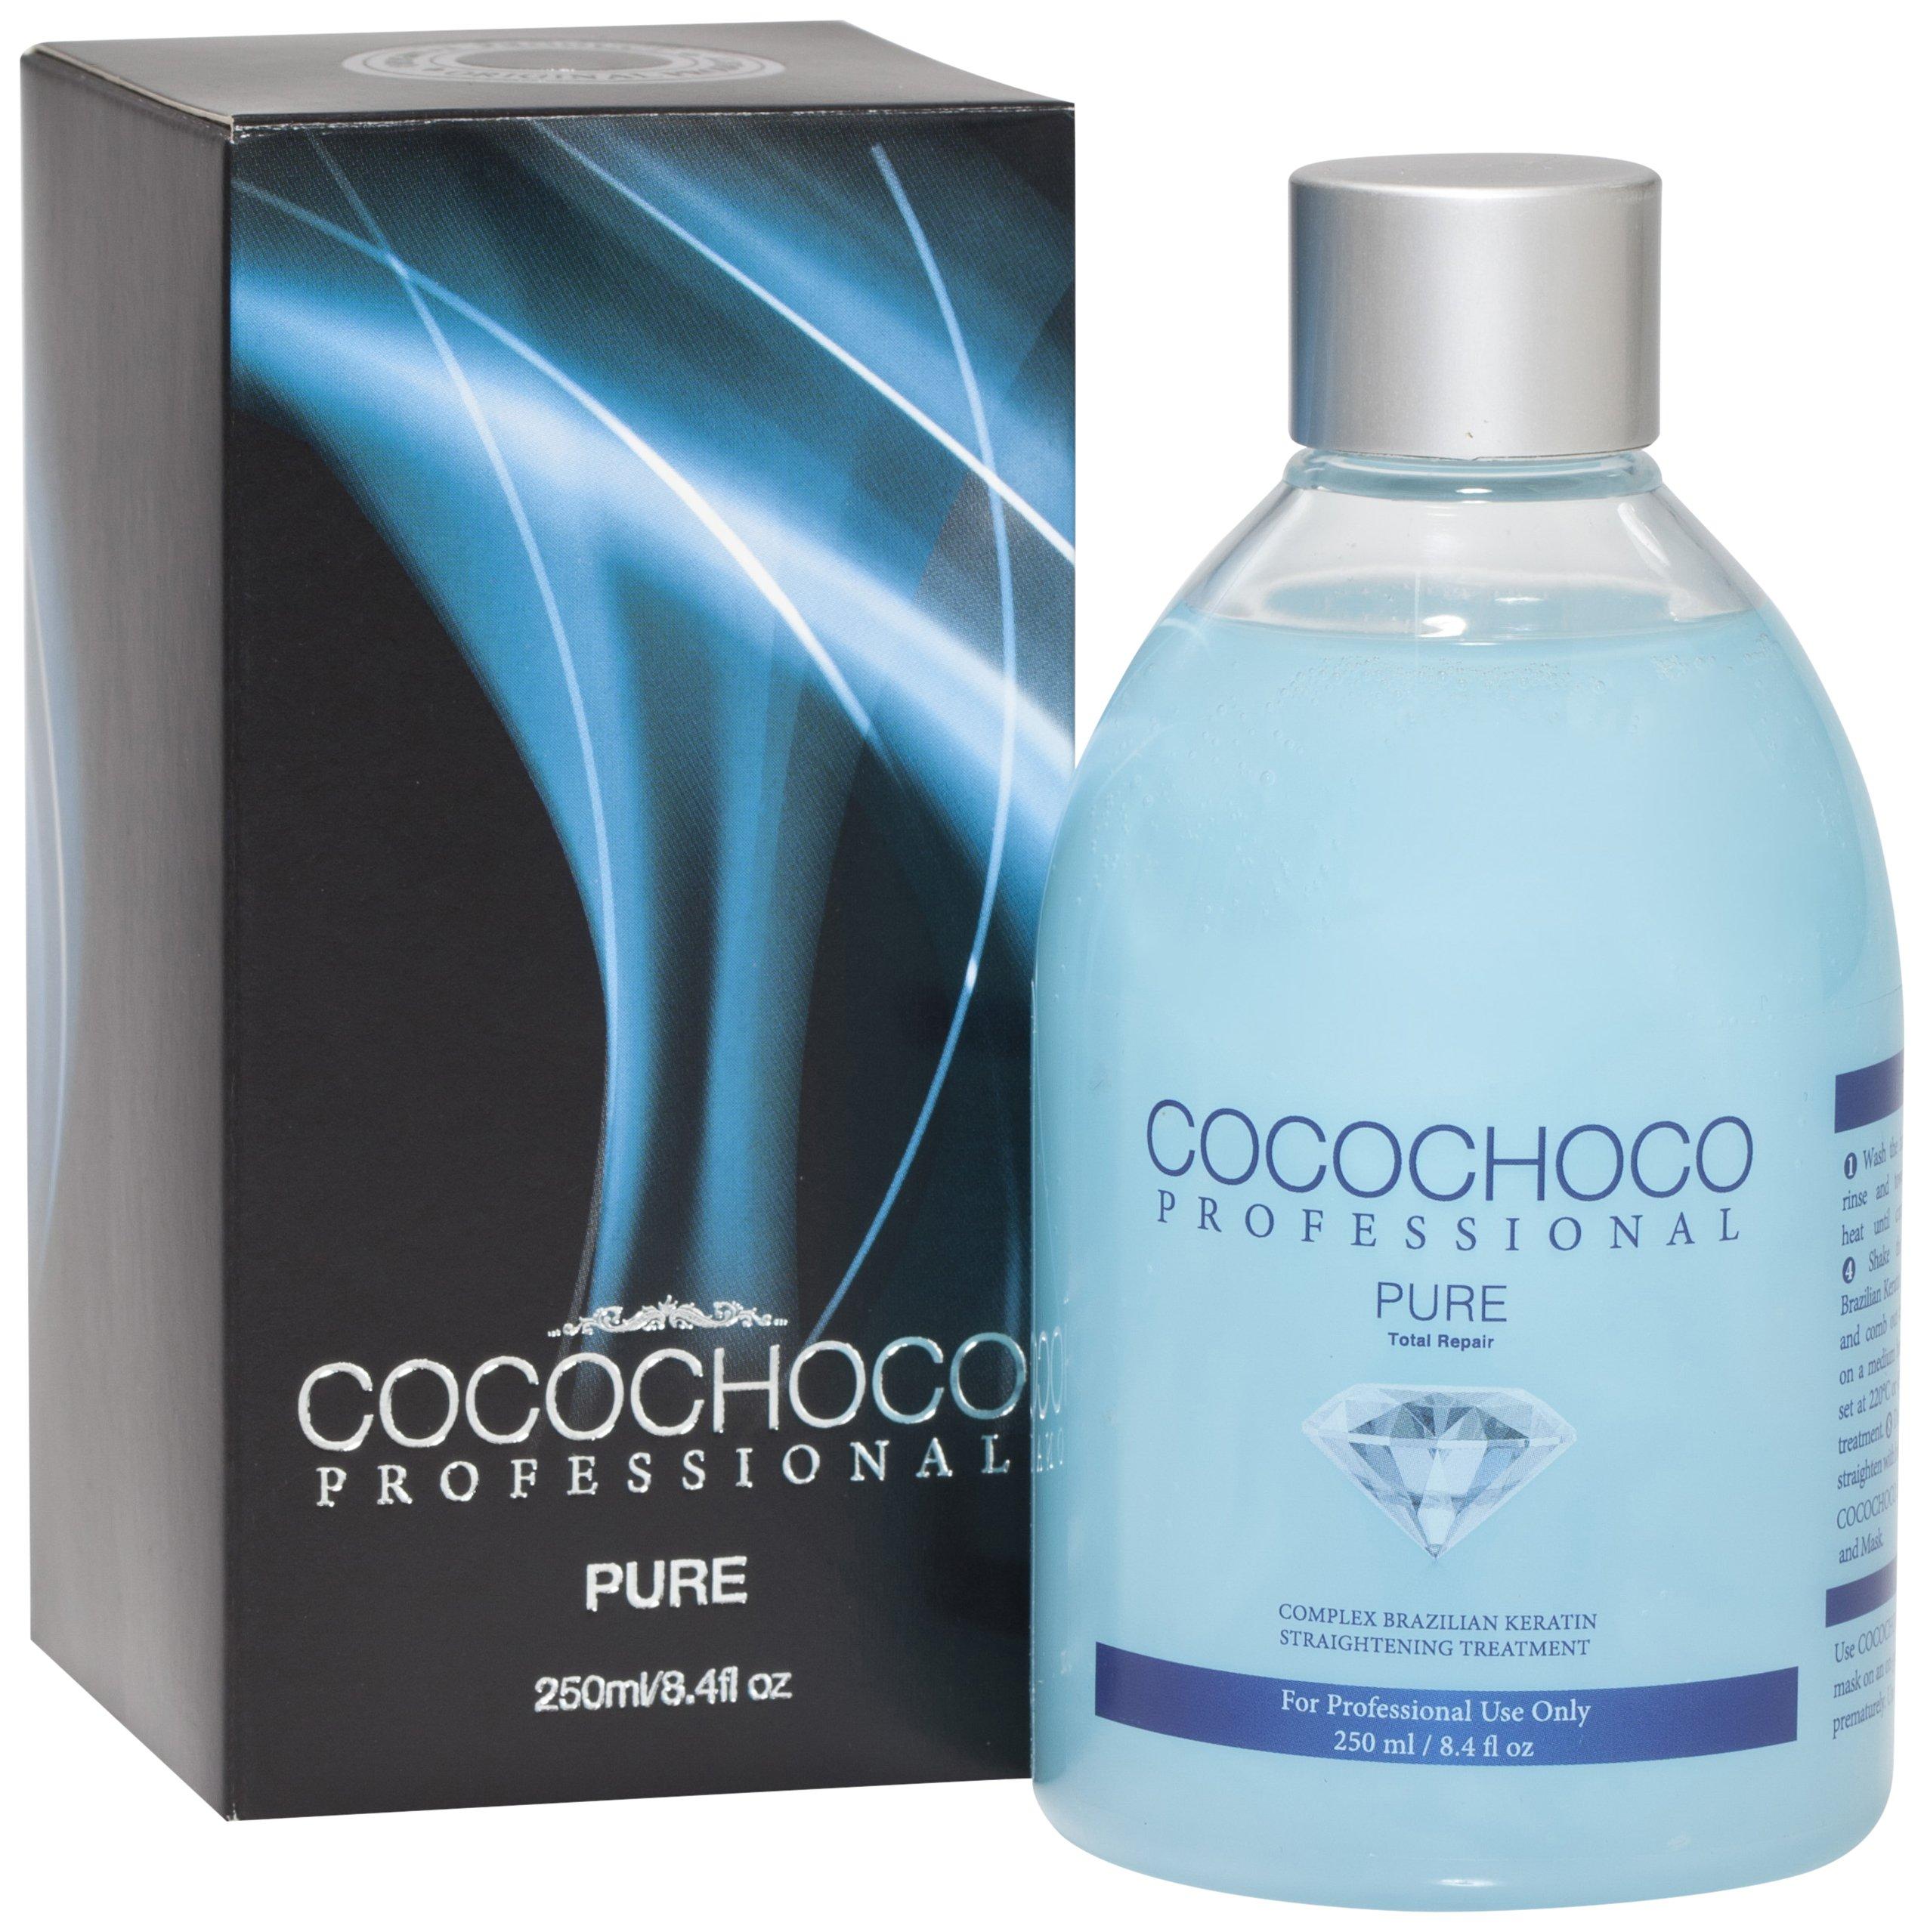 Cocochoco Professional Pure Total Repair Brazilian Keratin Hair Treatment, 250 ml